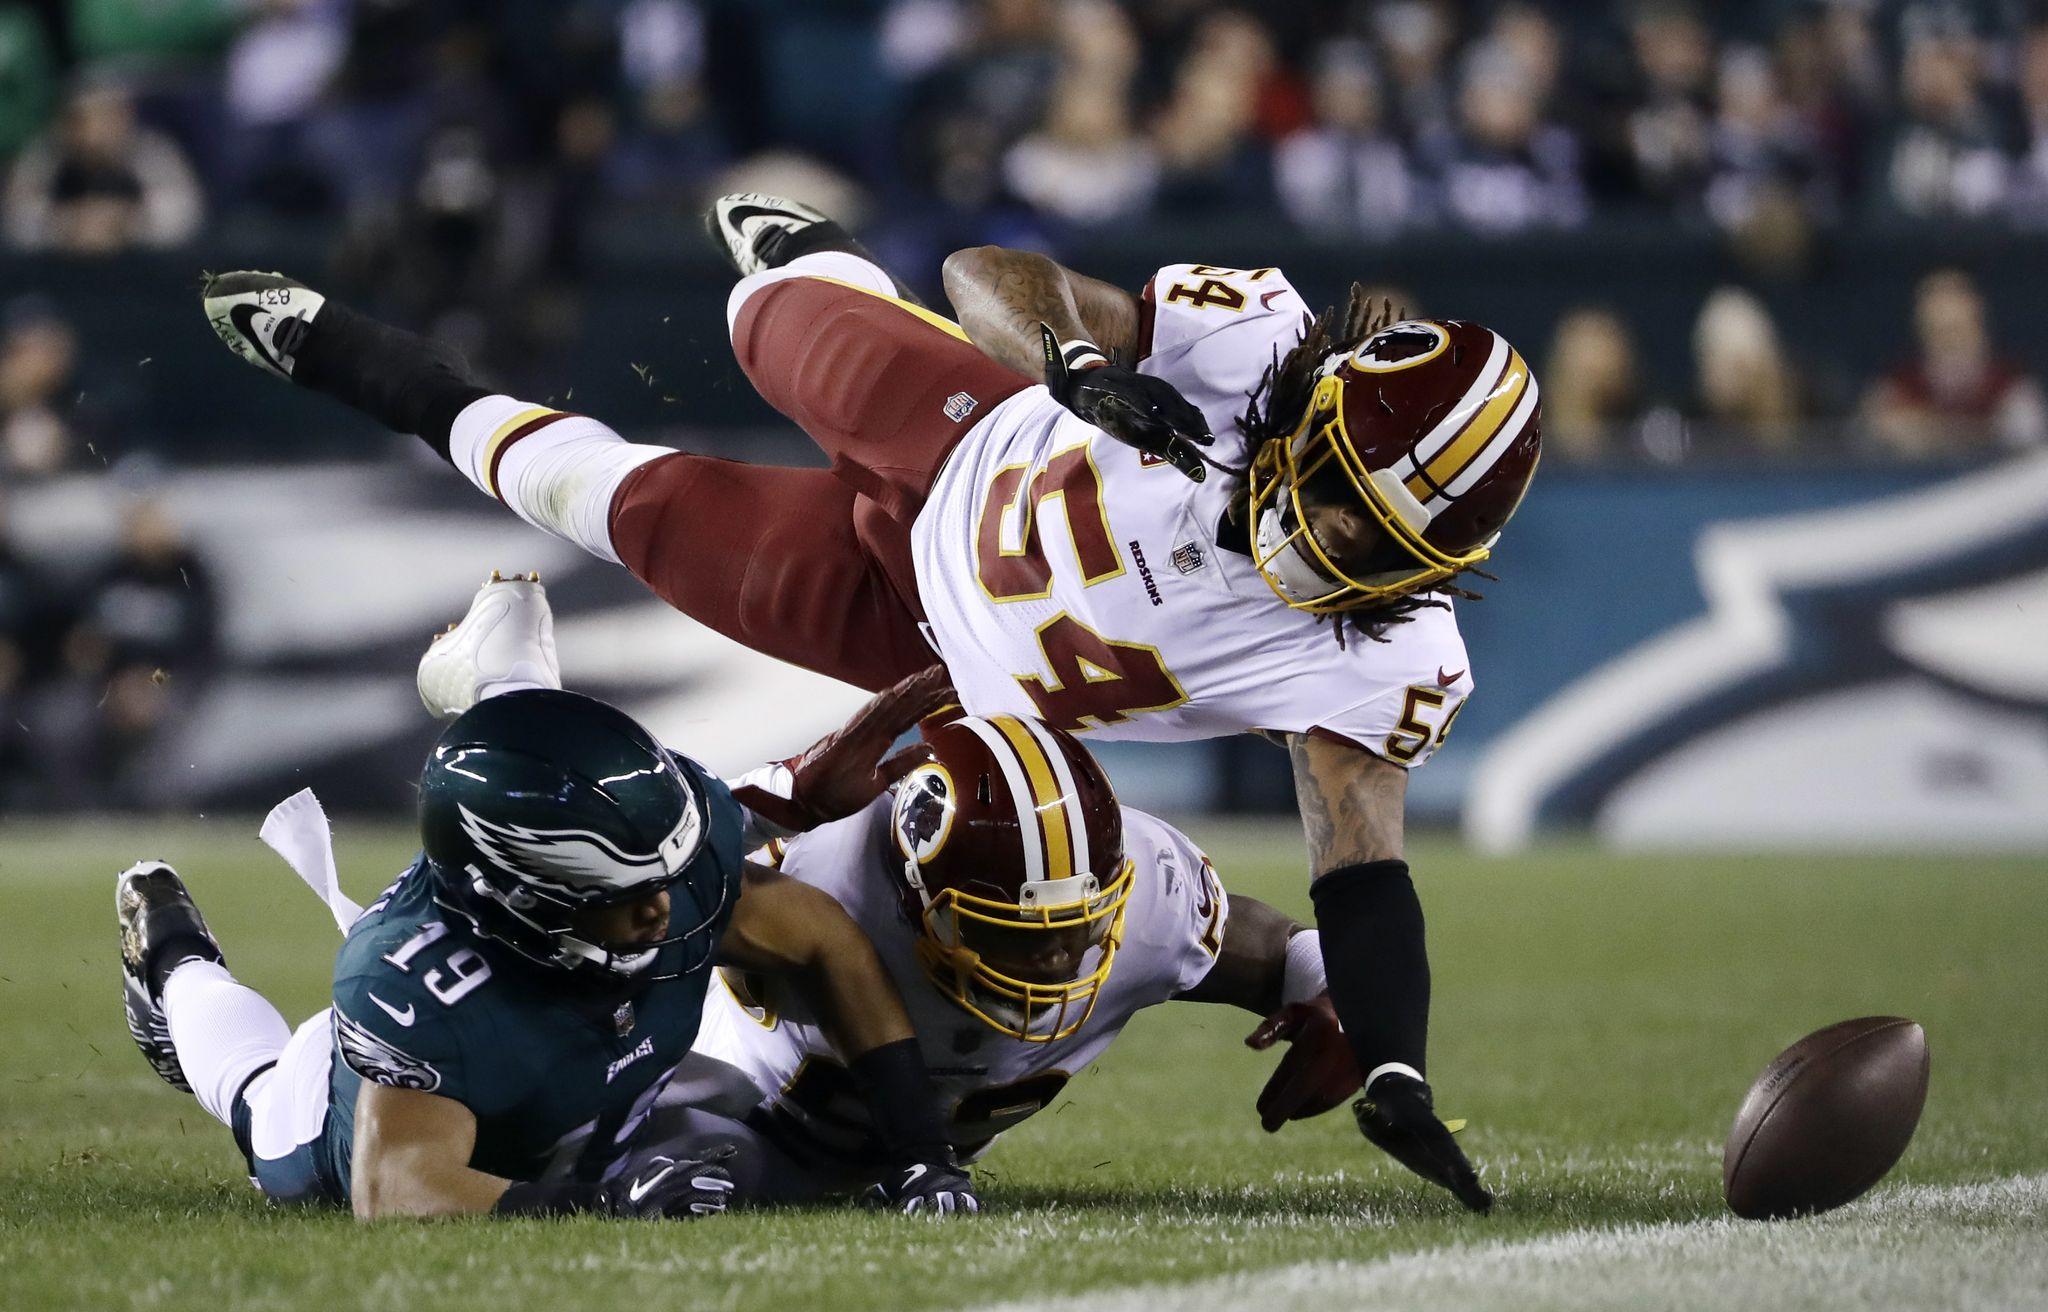 Redskins_eagles_football_16433.jpg-680c2_s2048x1312